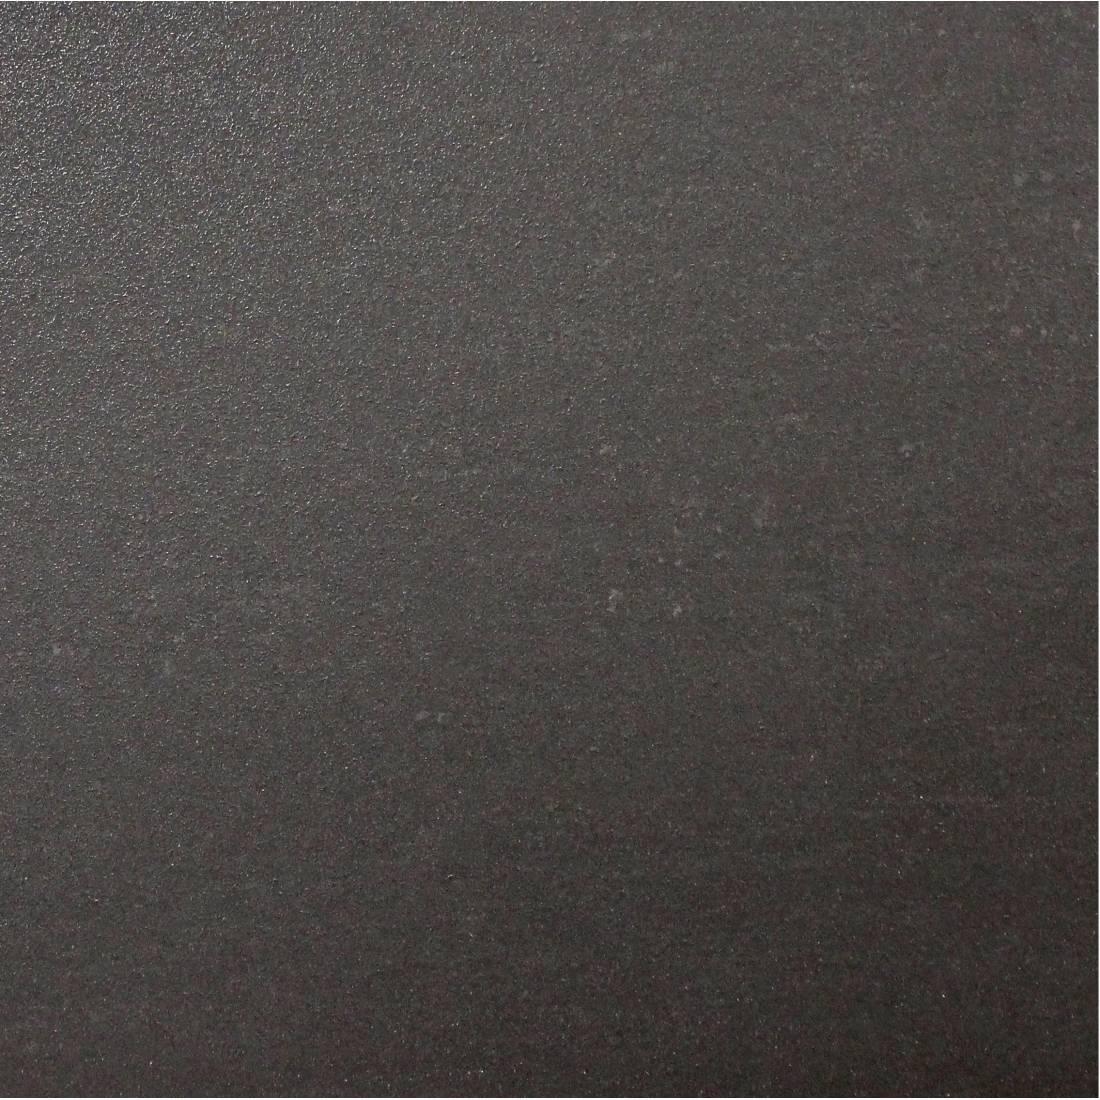 Galaxy Cosmos 60x60 Black Matt 1